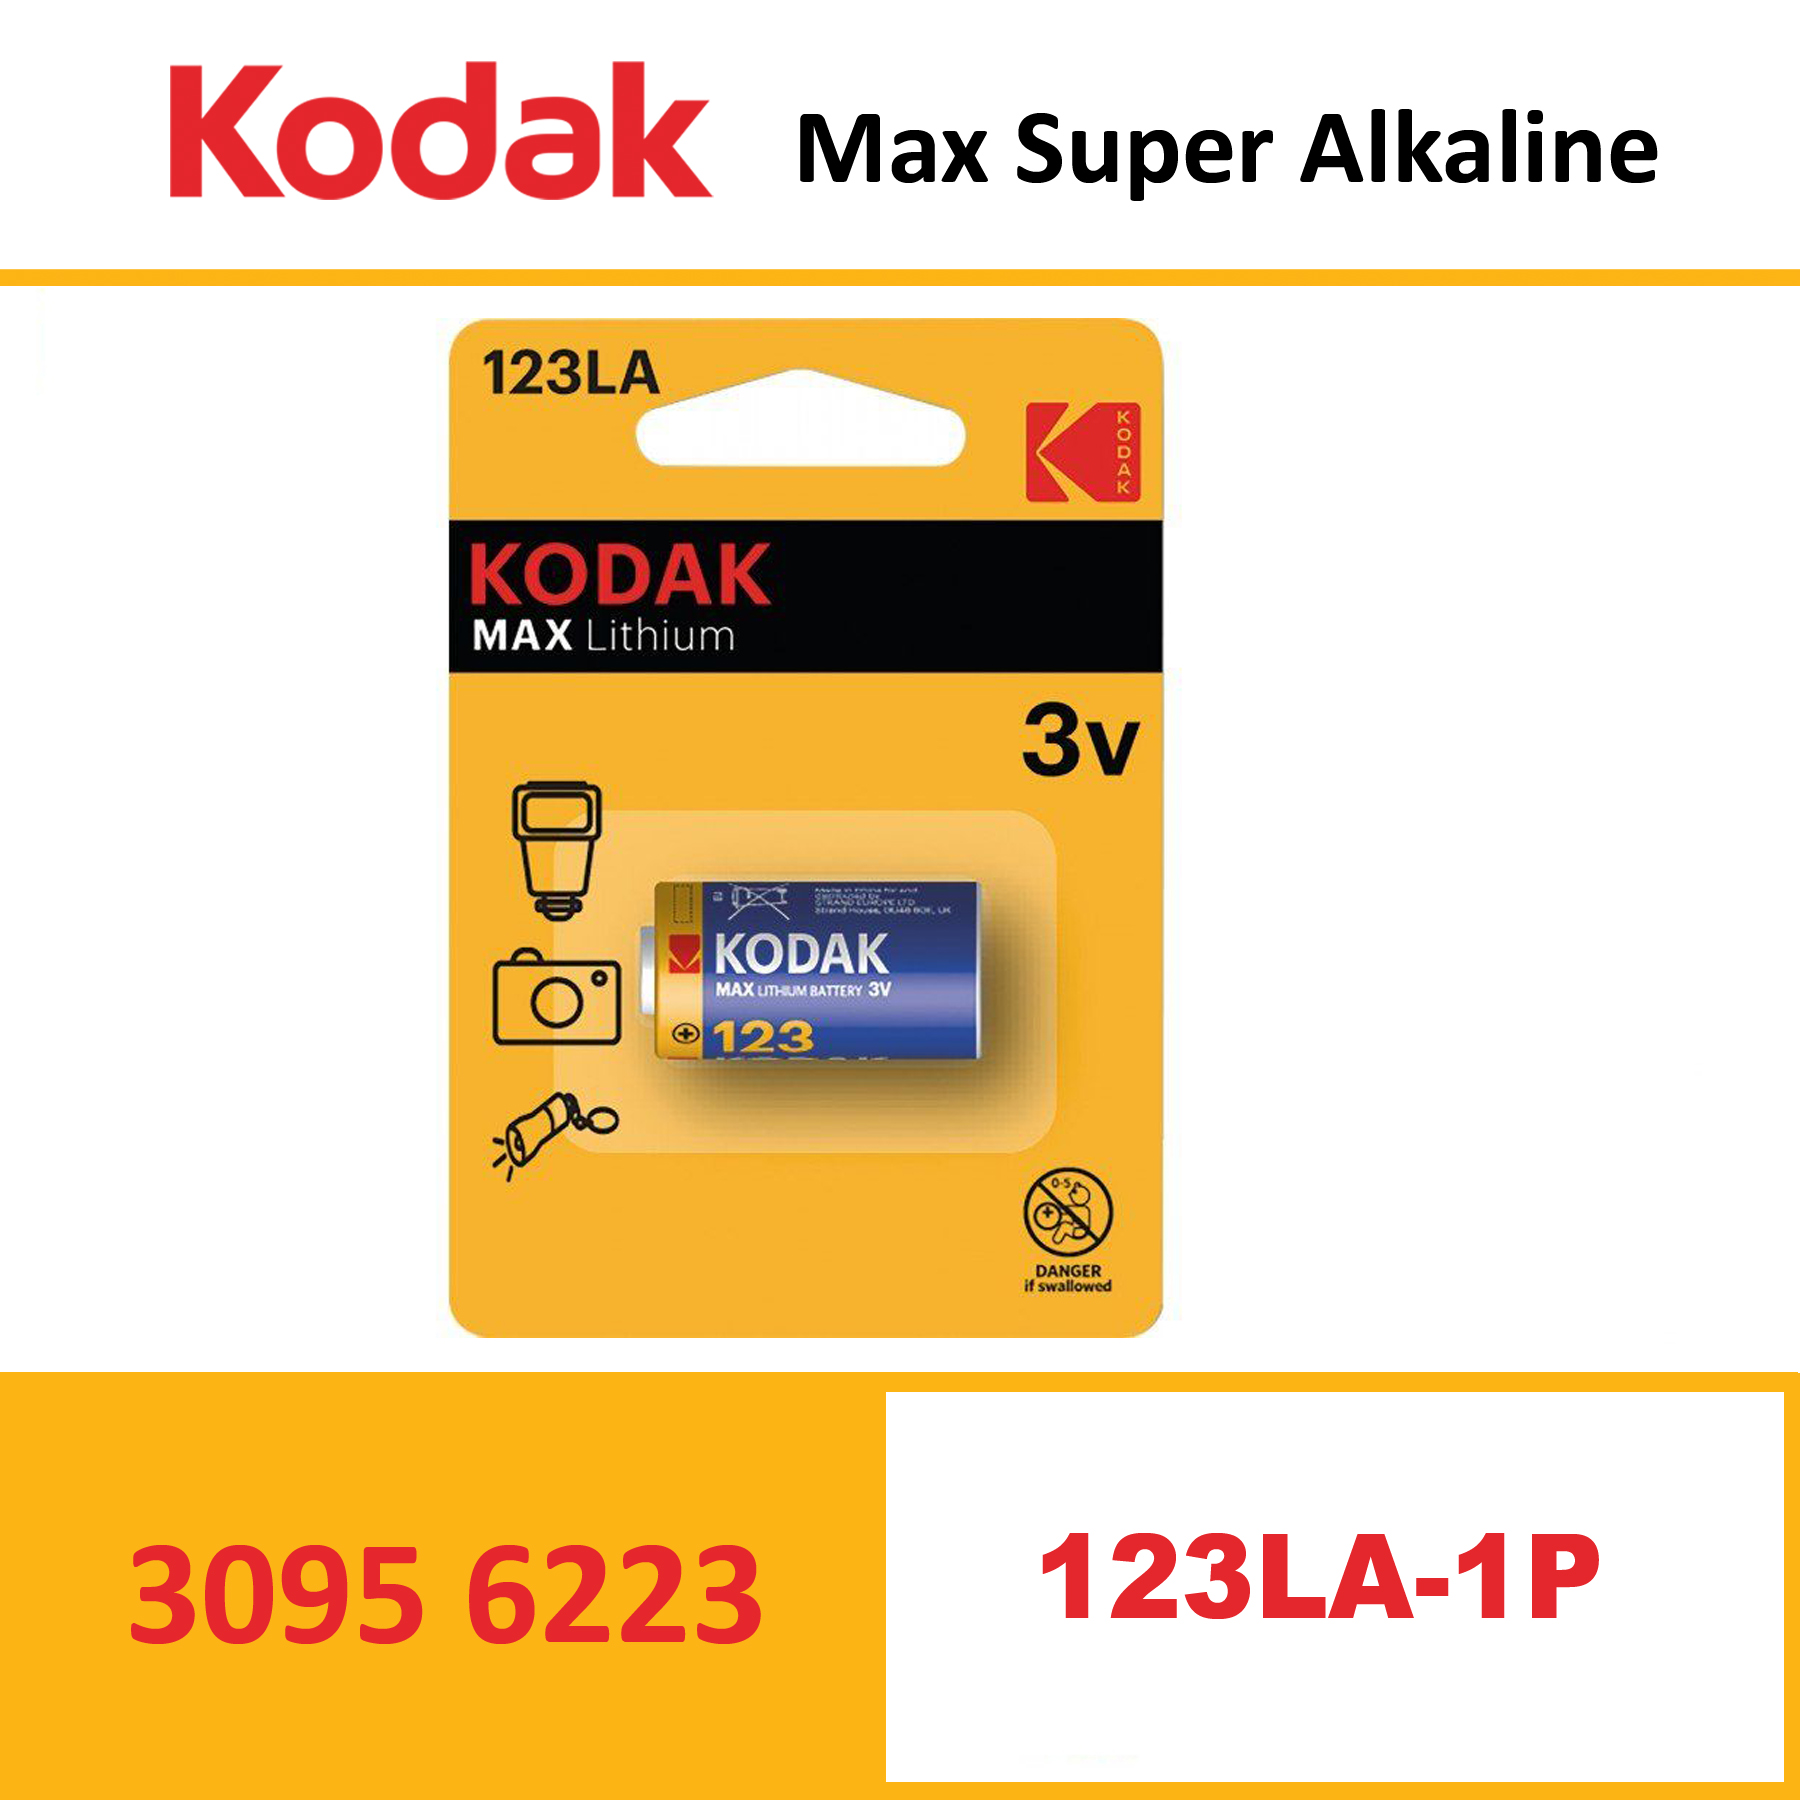 KODAK K123LA MAX Lithium battery